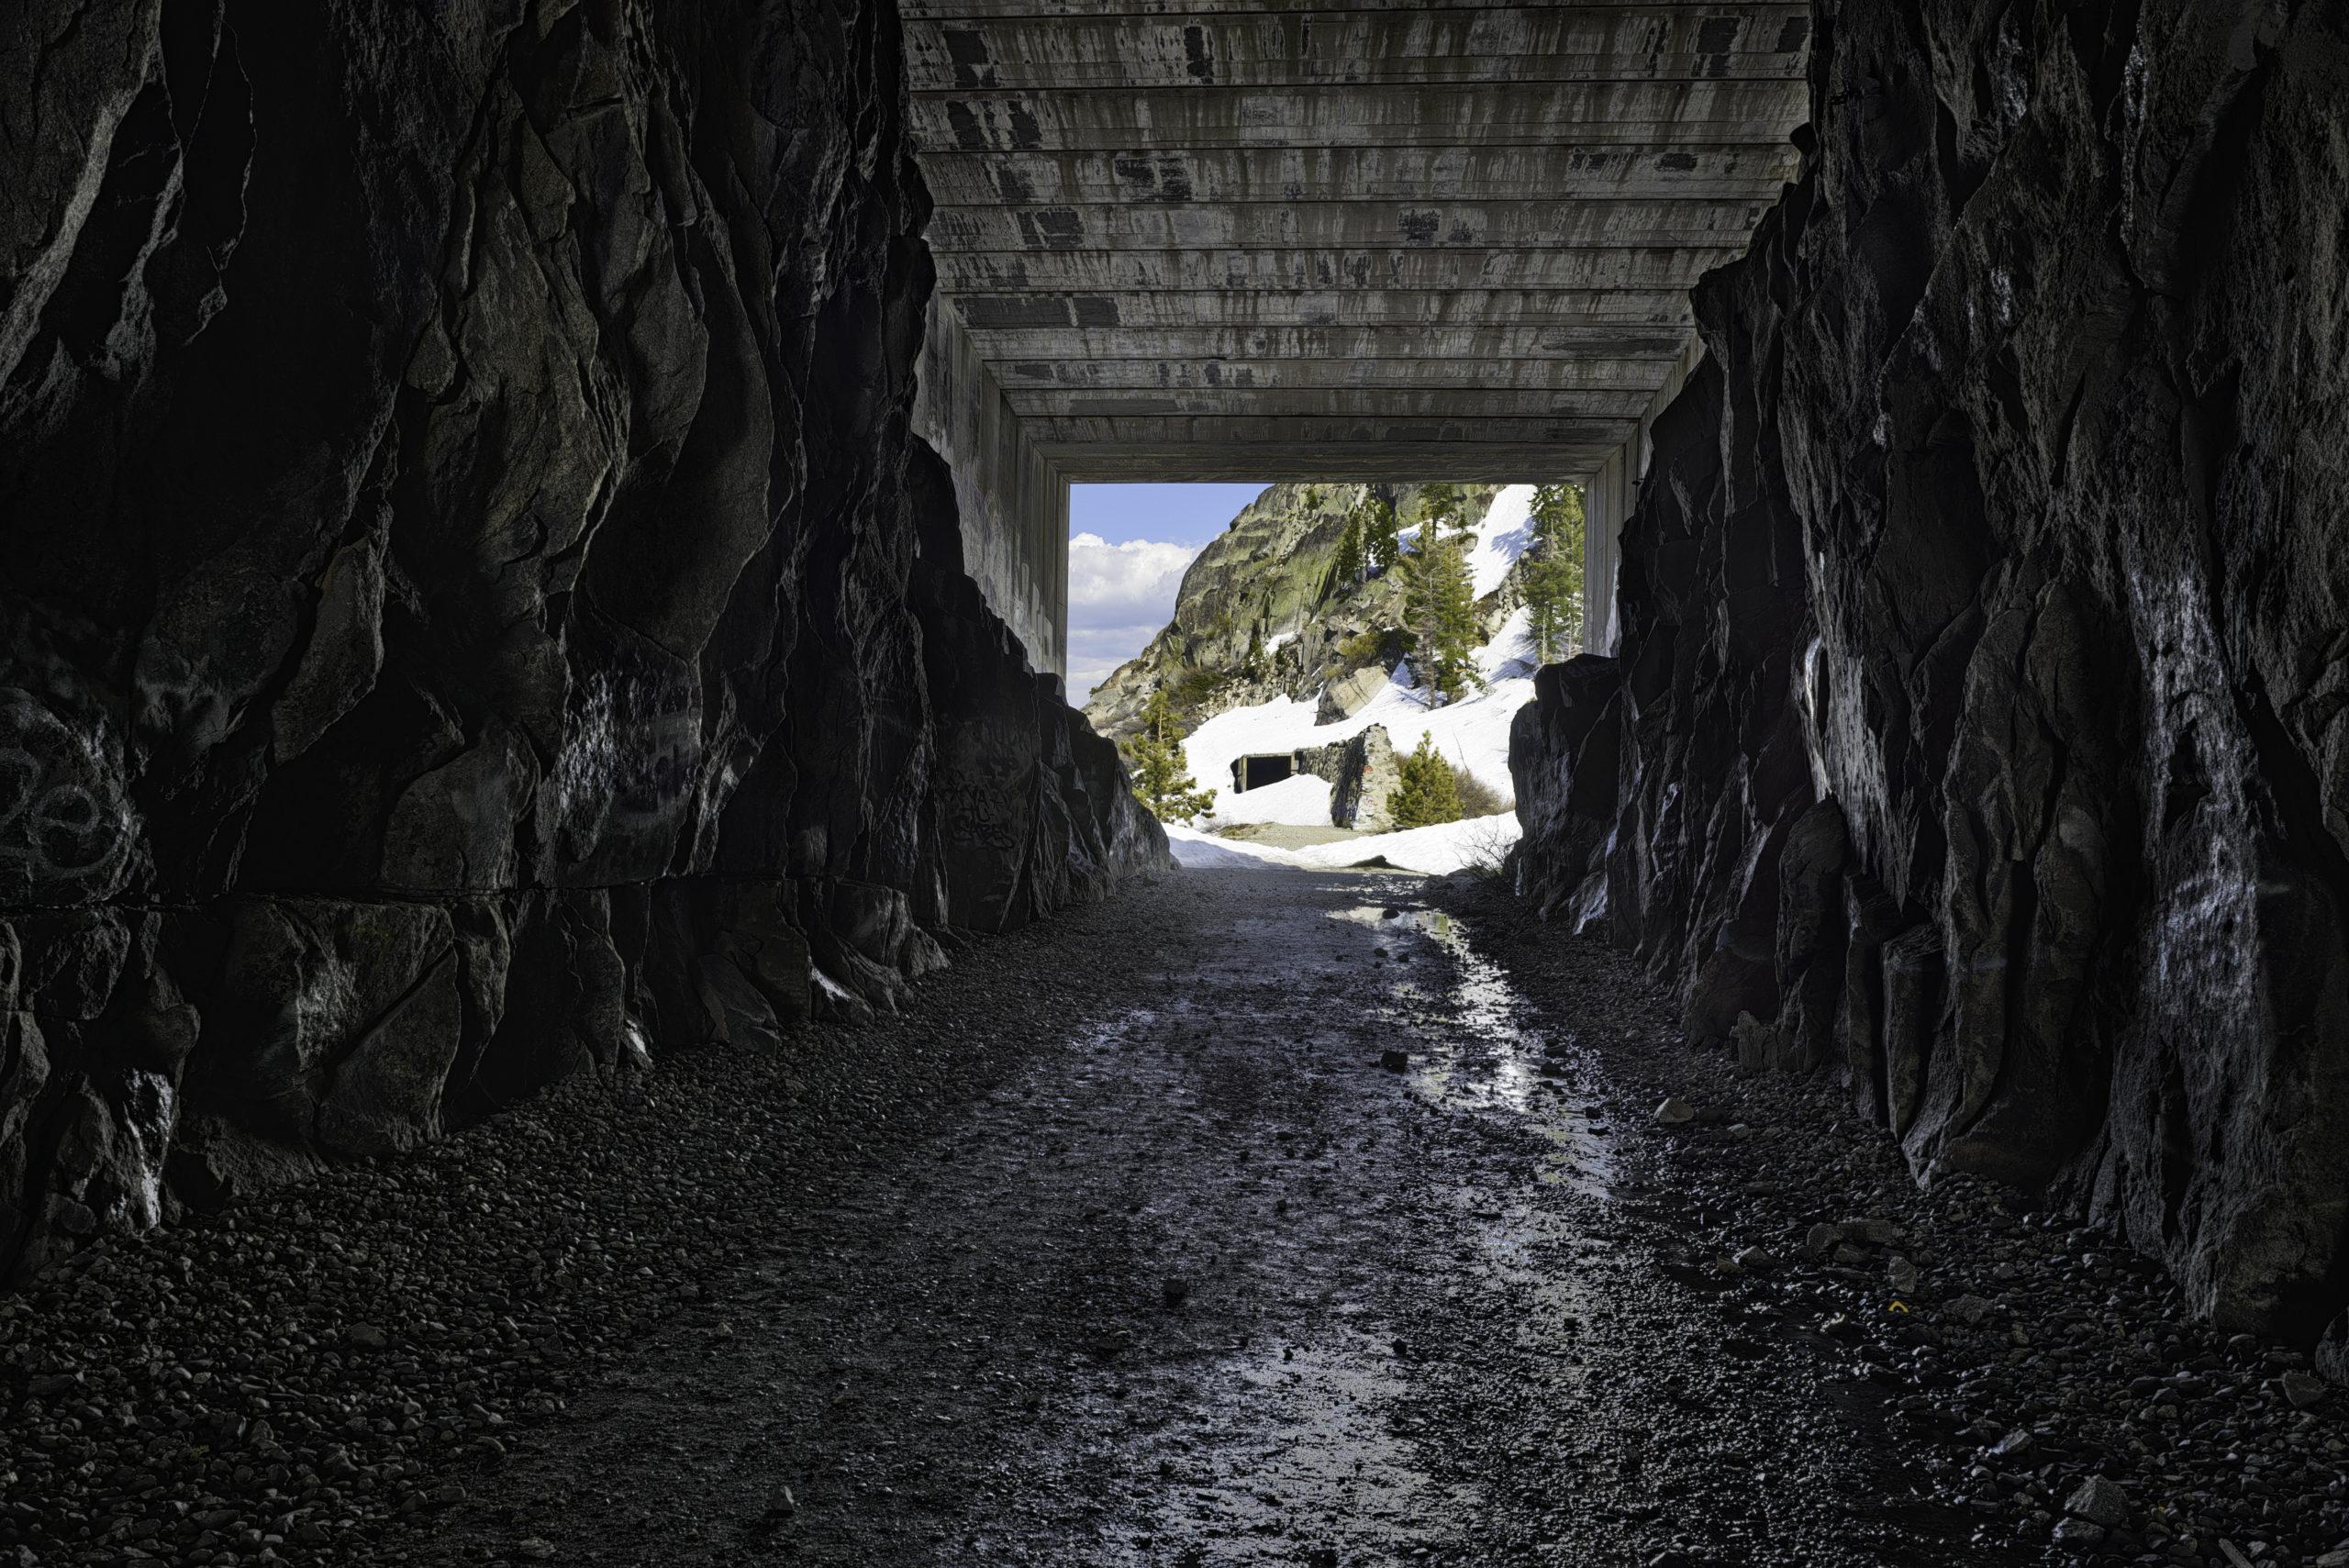 Ikon Pass California Donner Tunnels